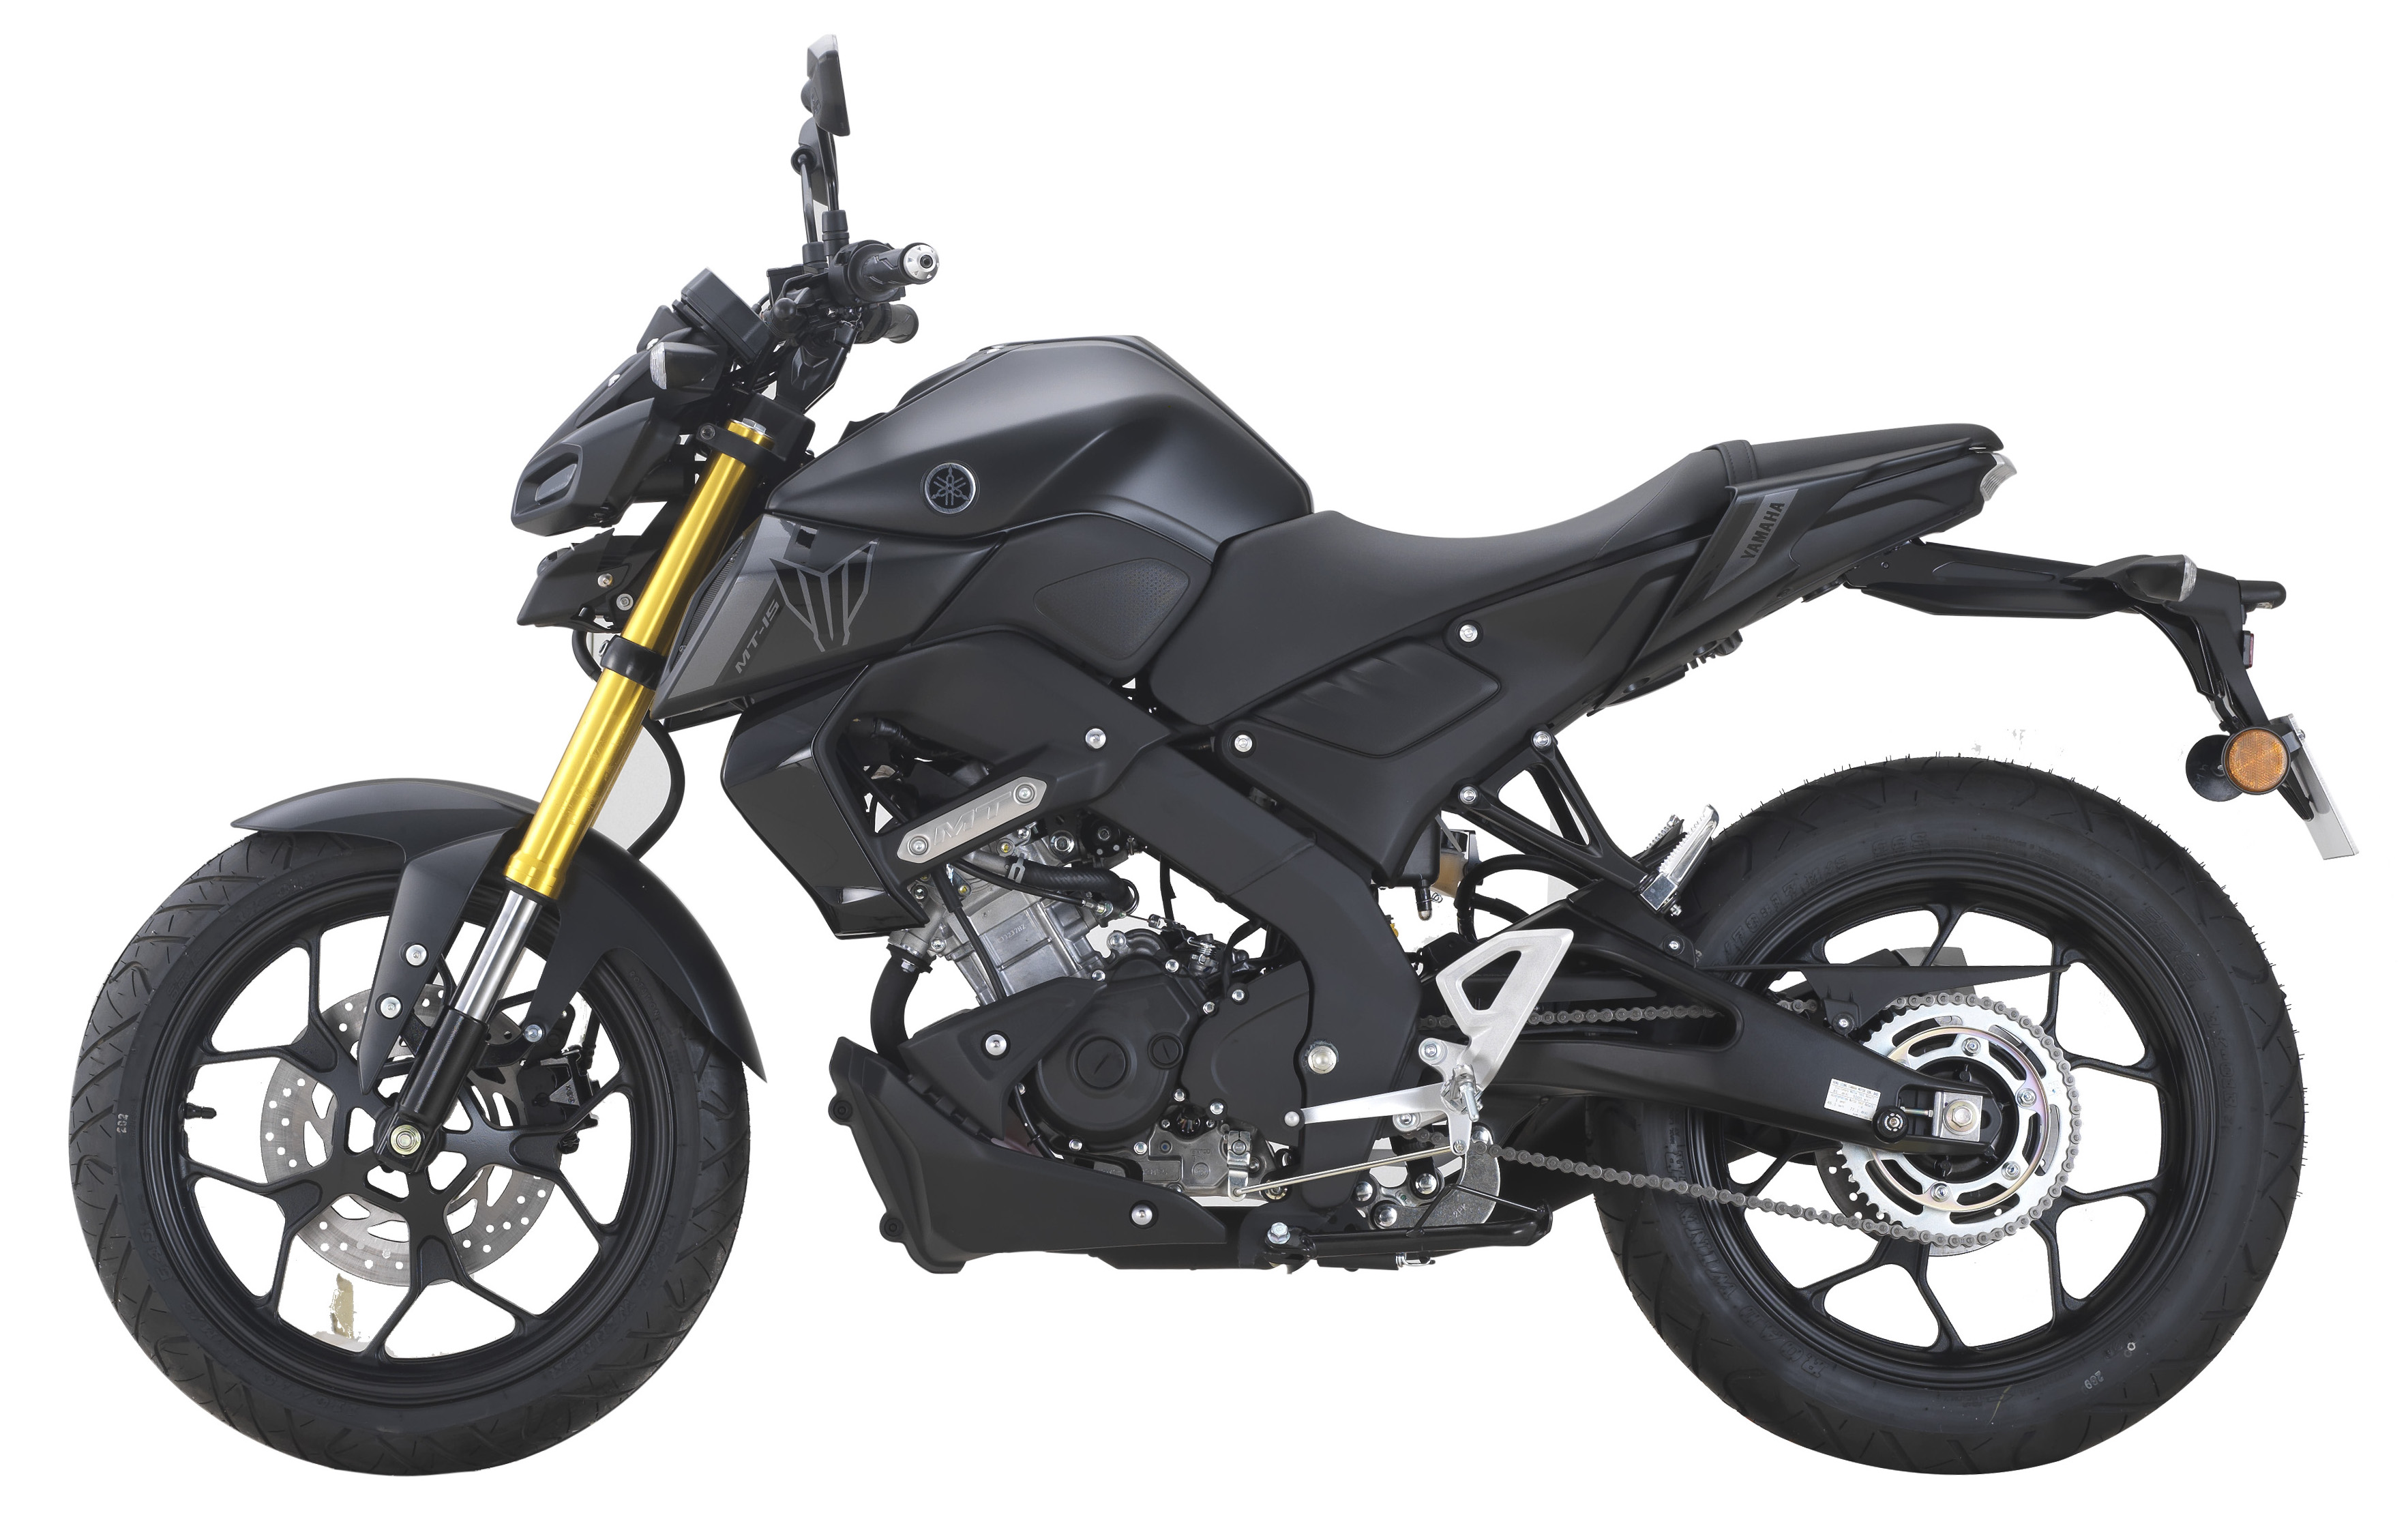 2021 Yamaha MT-15 Black - 4